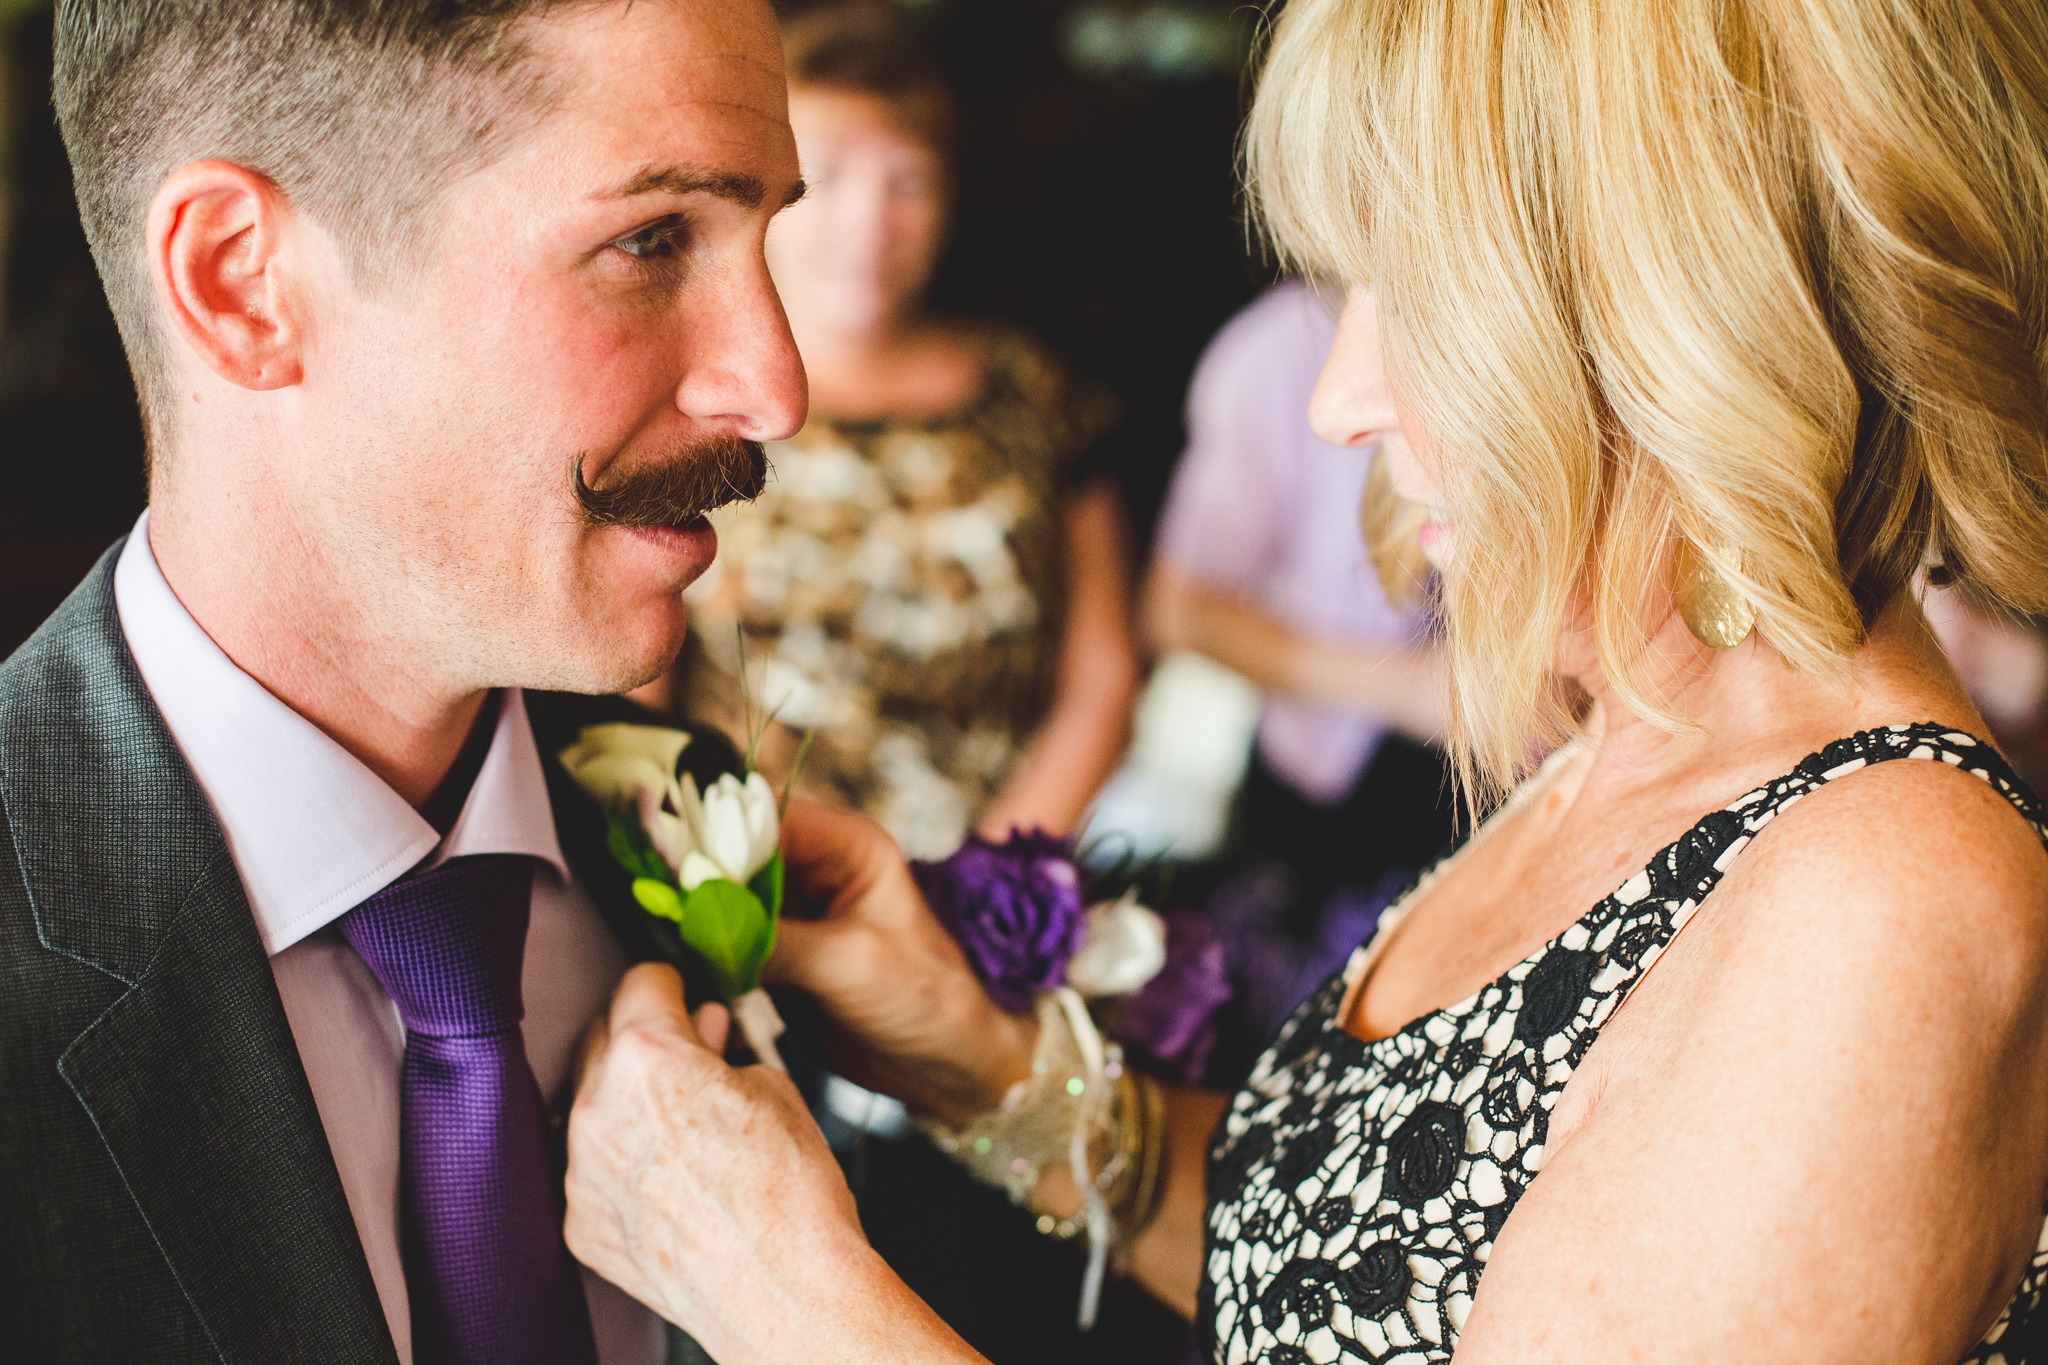 groom gets boutonnière put on